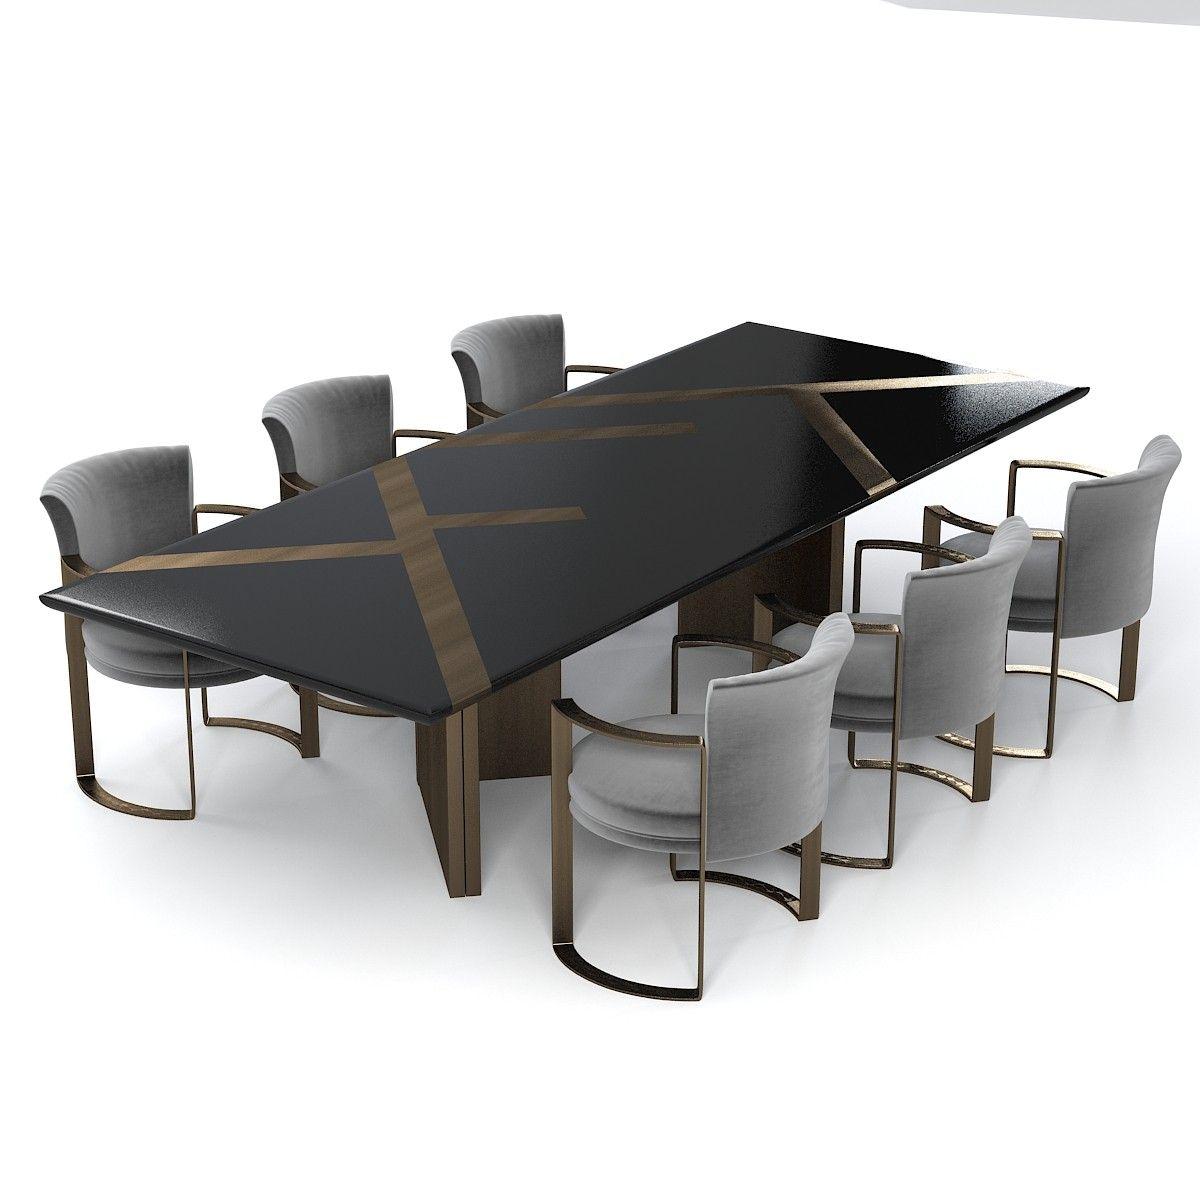 3d Model Fendi Casa Margutta 家具 In 2019 Luxury Dining